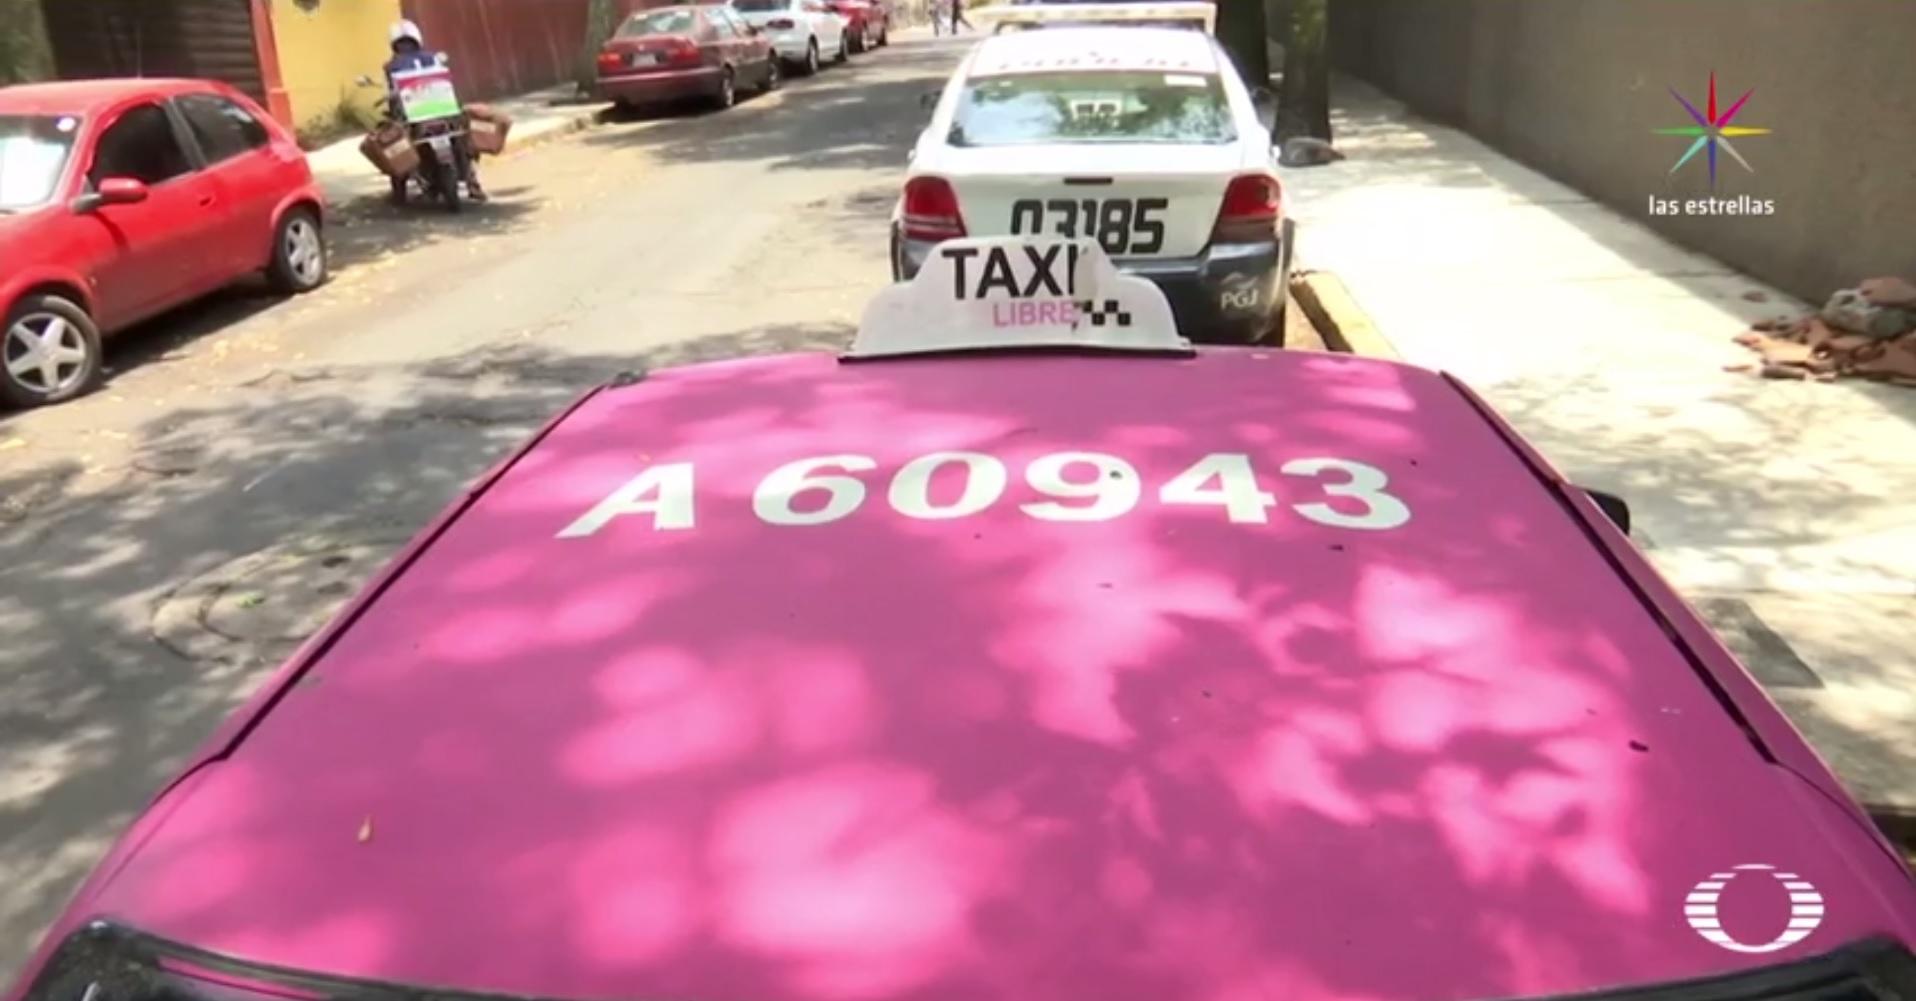 Hermano de taxista se culpa de asaltar a joven en Tlalpan